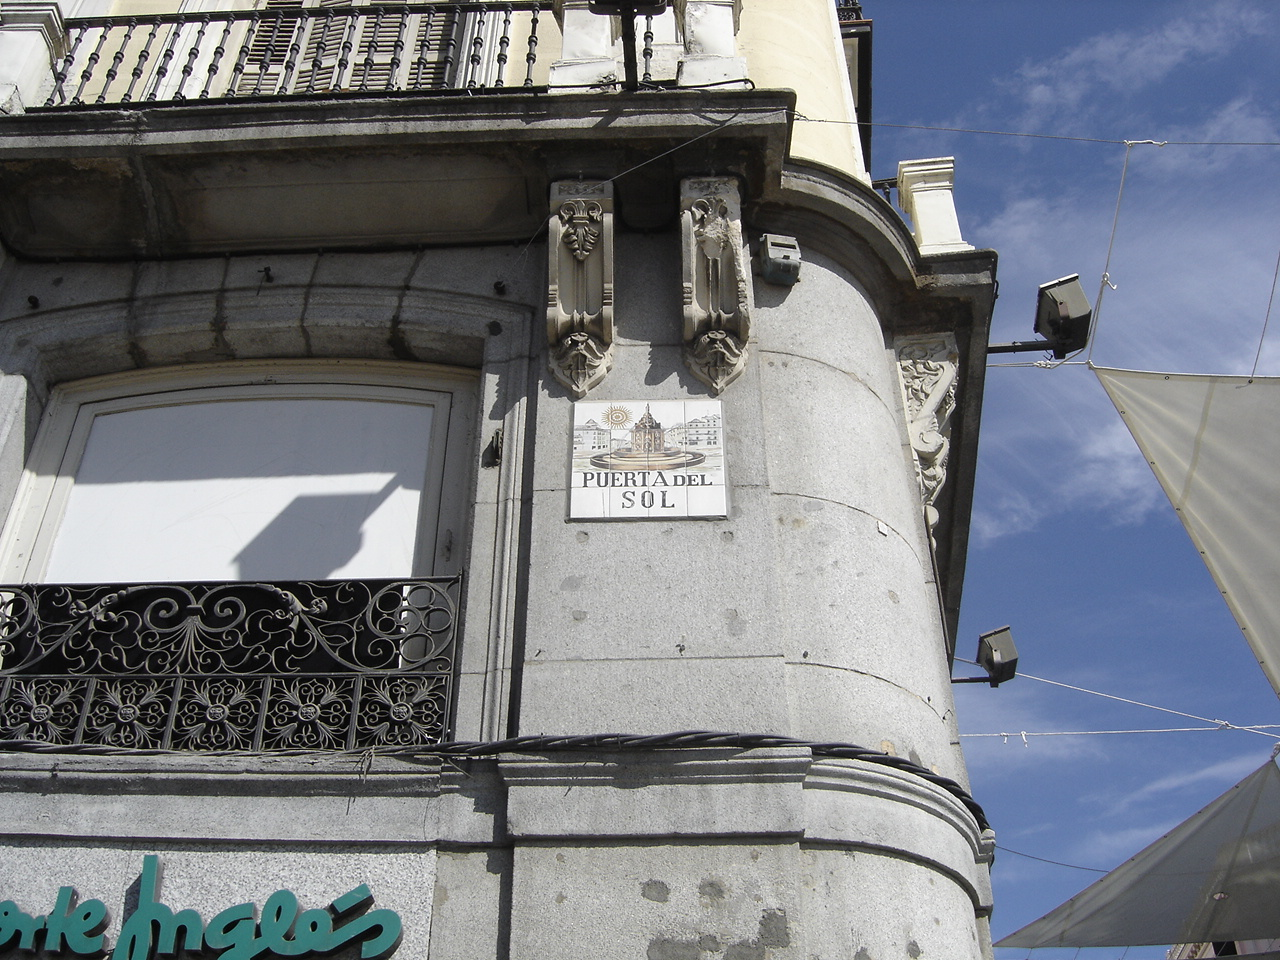 S Bor Puerta Del Sol 2 Madrid Jpg Wikip Dia